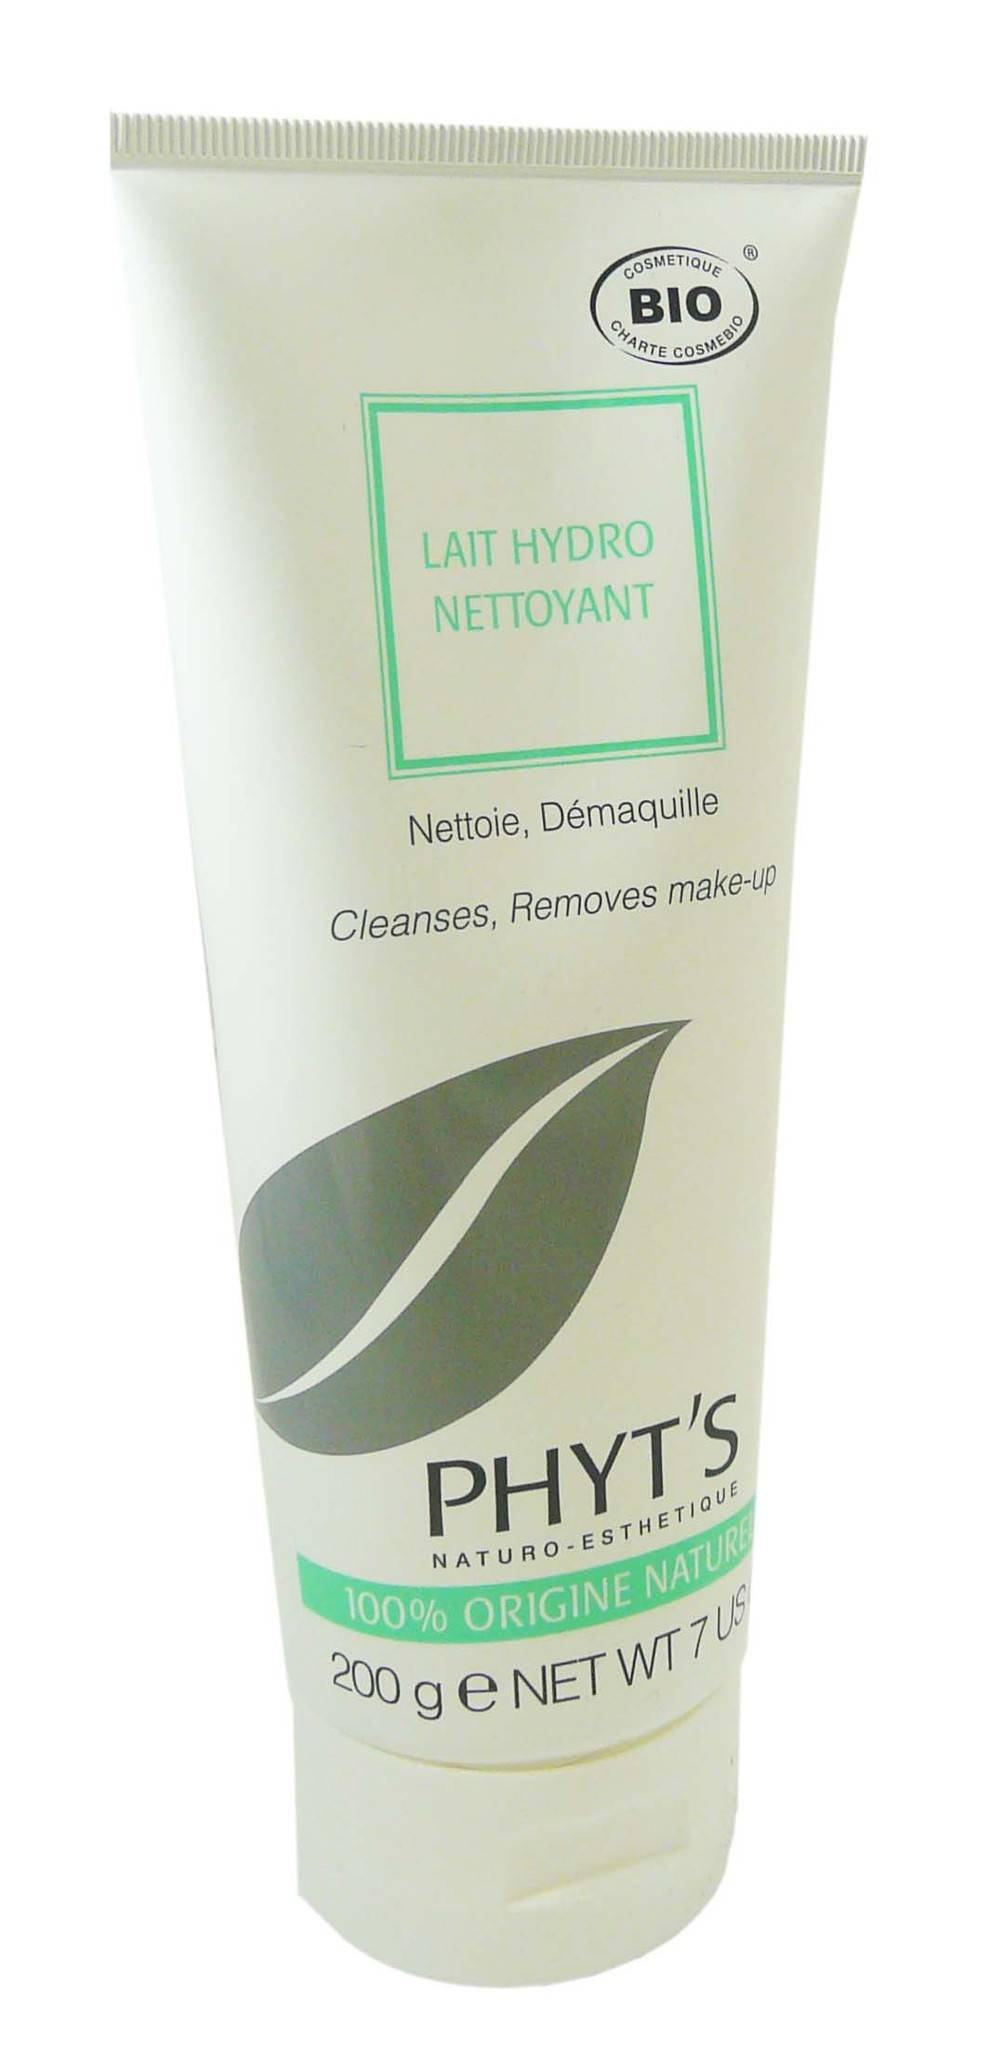 Phyt's lait hydro nettoyant 200g